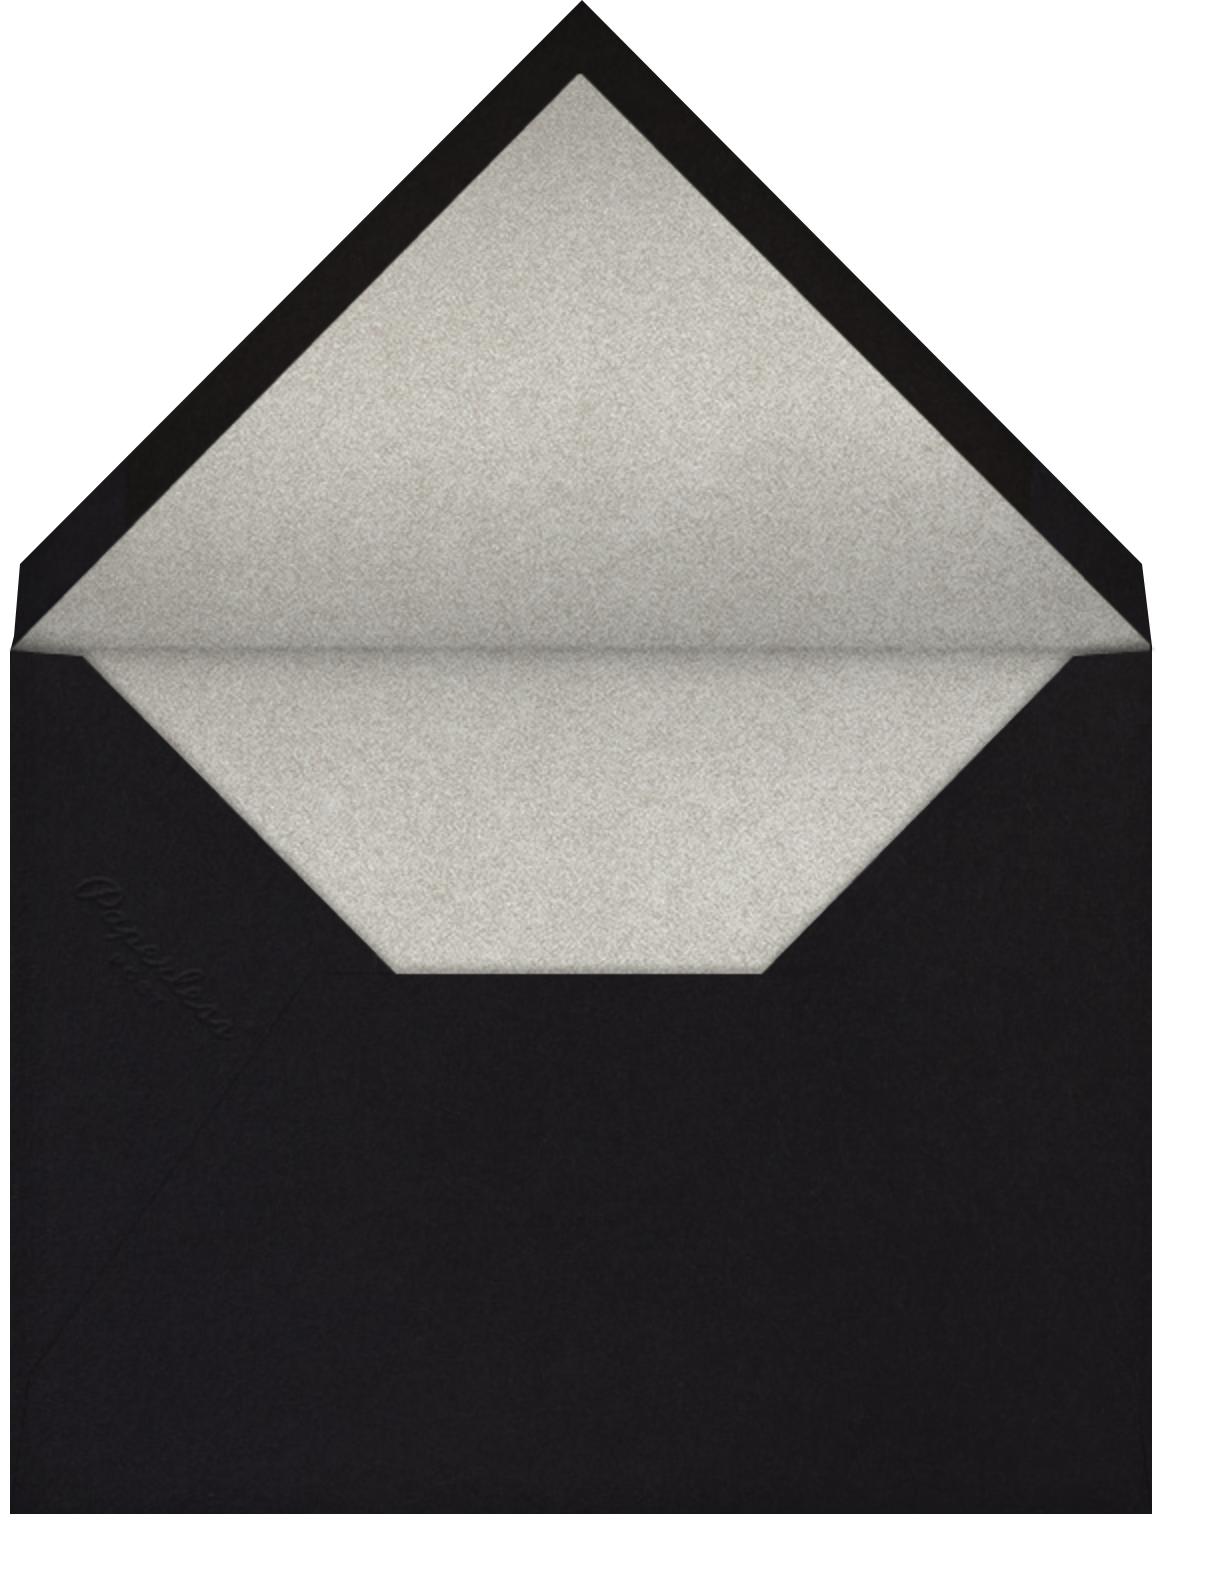 Cheers on Cheers - Silver - Paperless Post - Adult birthday - envelope back